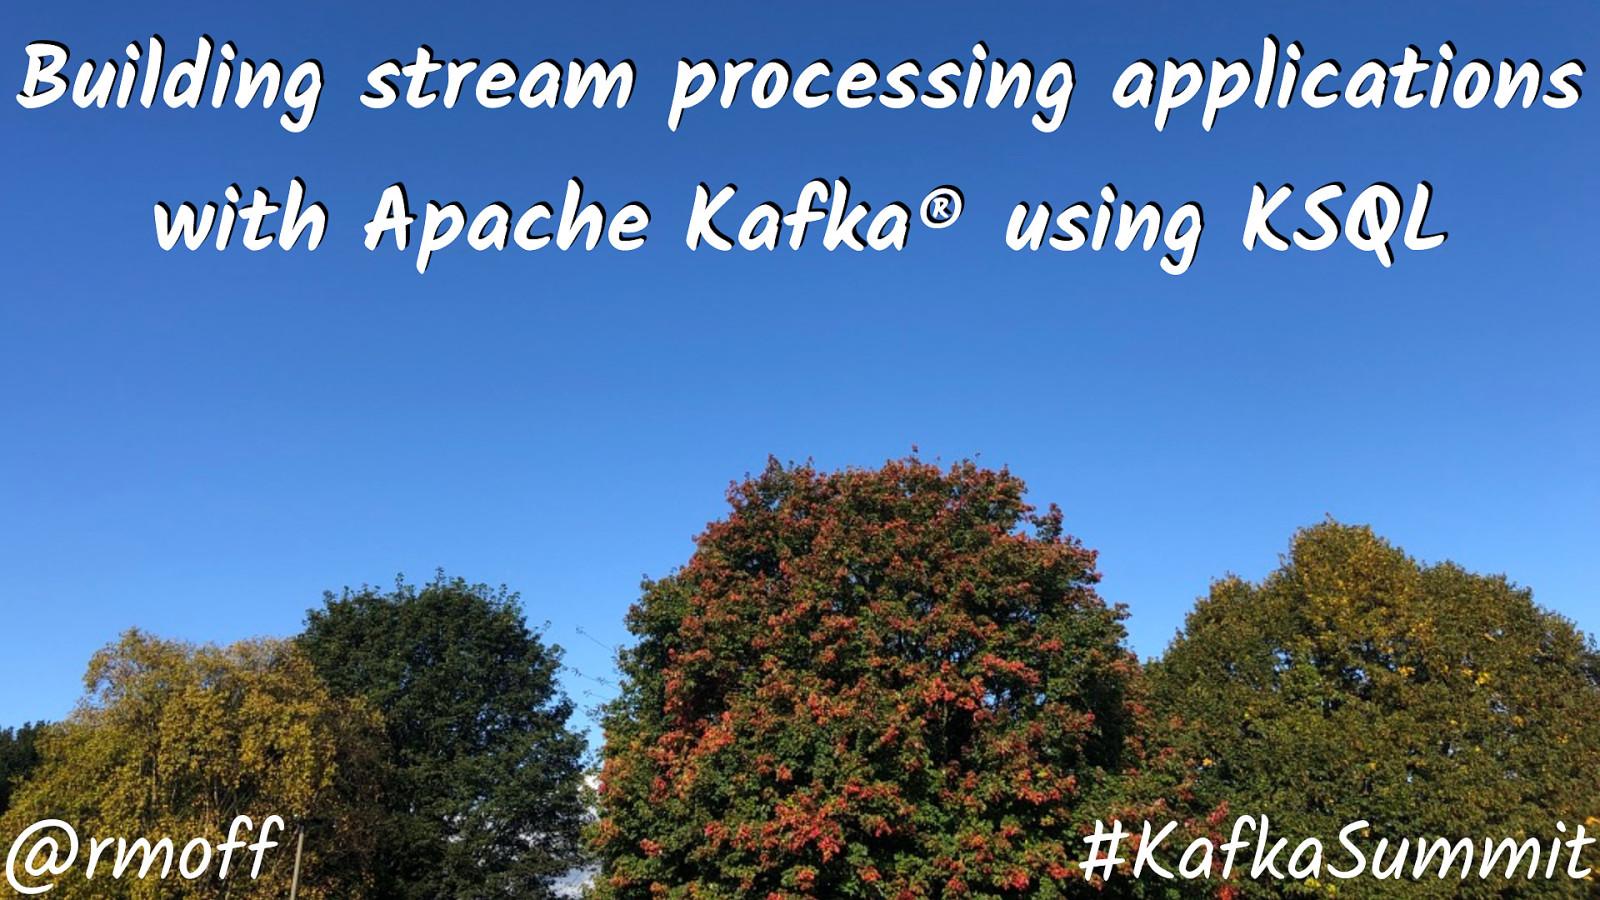 Building stream processing applications for Apache Kafka using KSQL